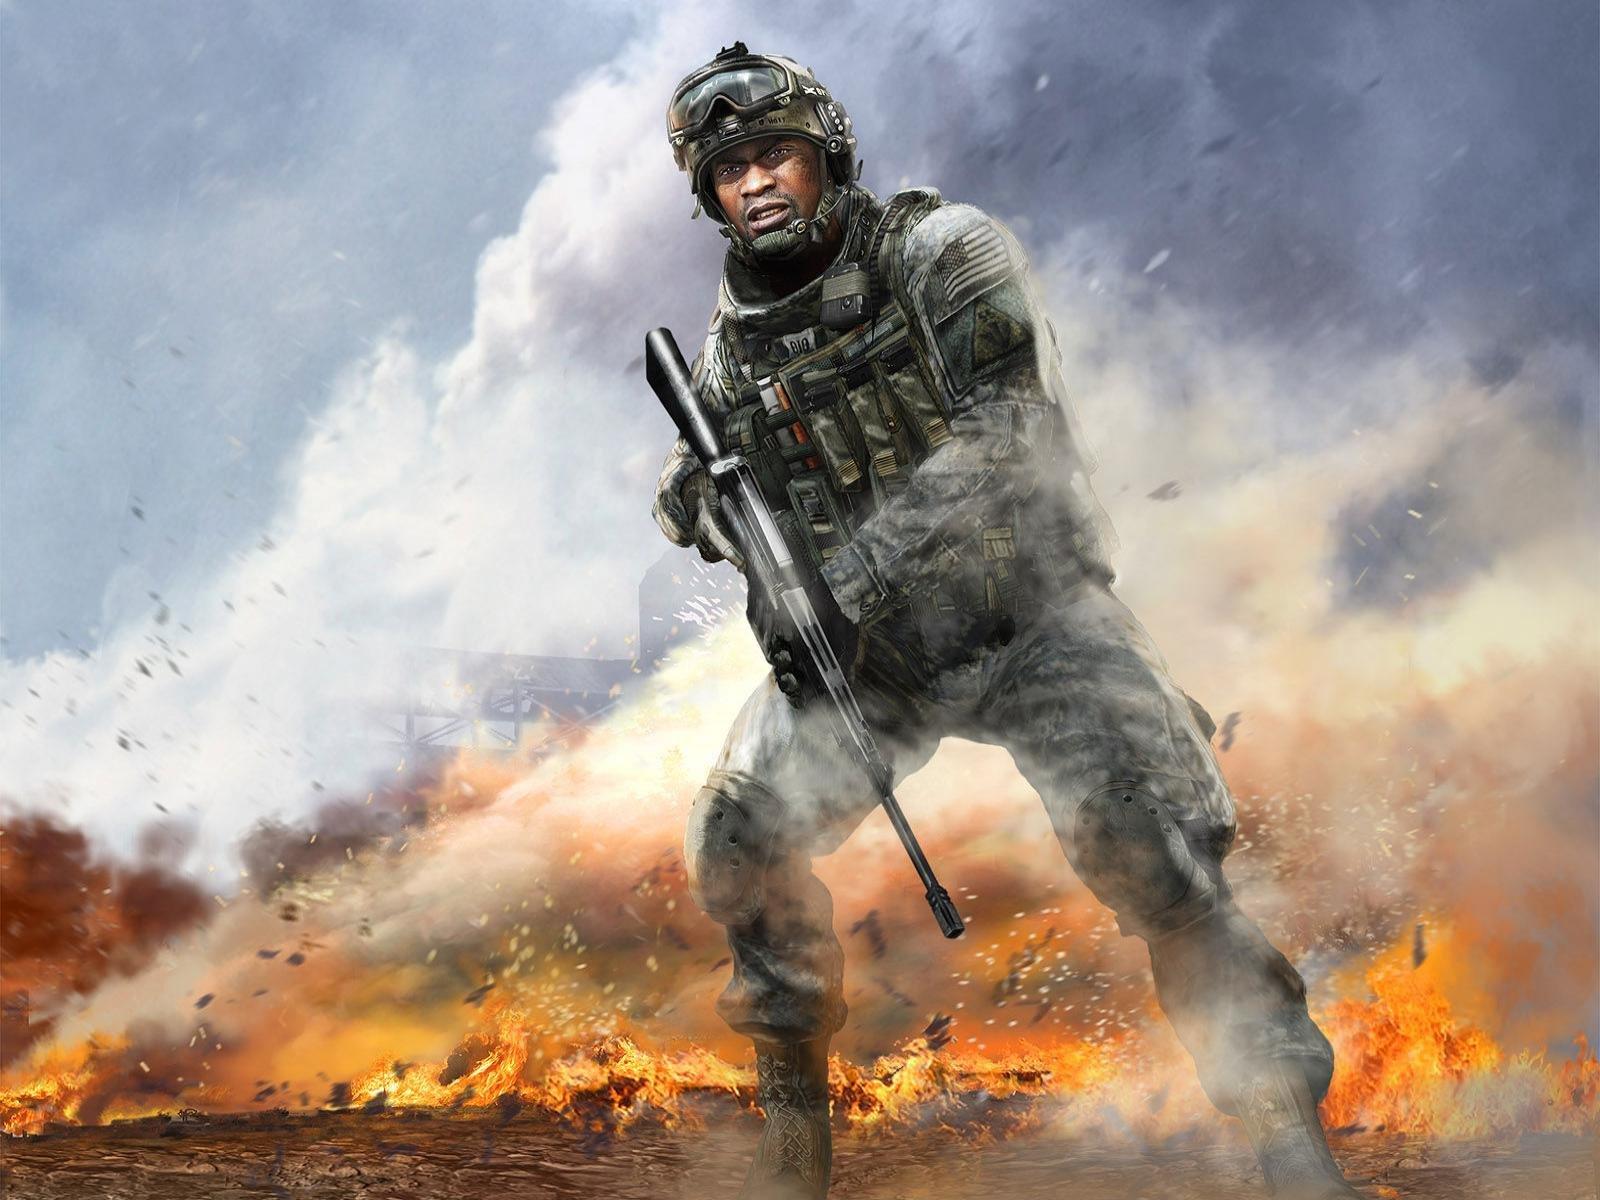 Call Of Duty 4 Modern Warfare Wallpapers Hd For Desktop Backgrounds